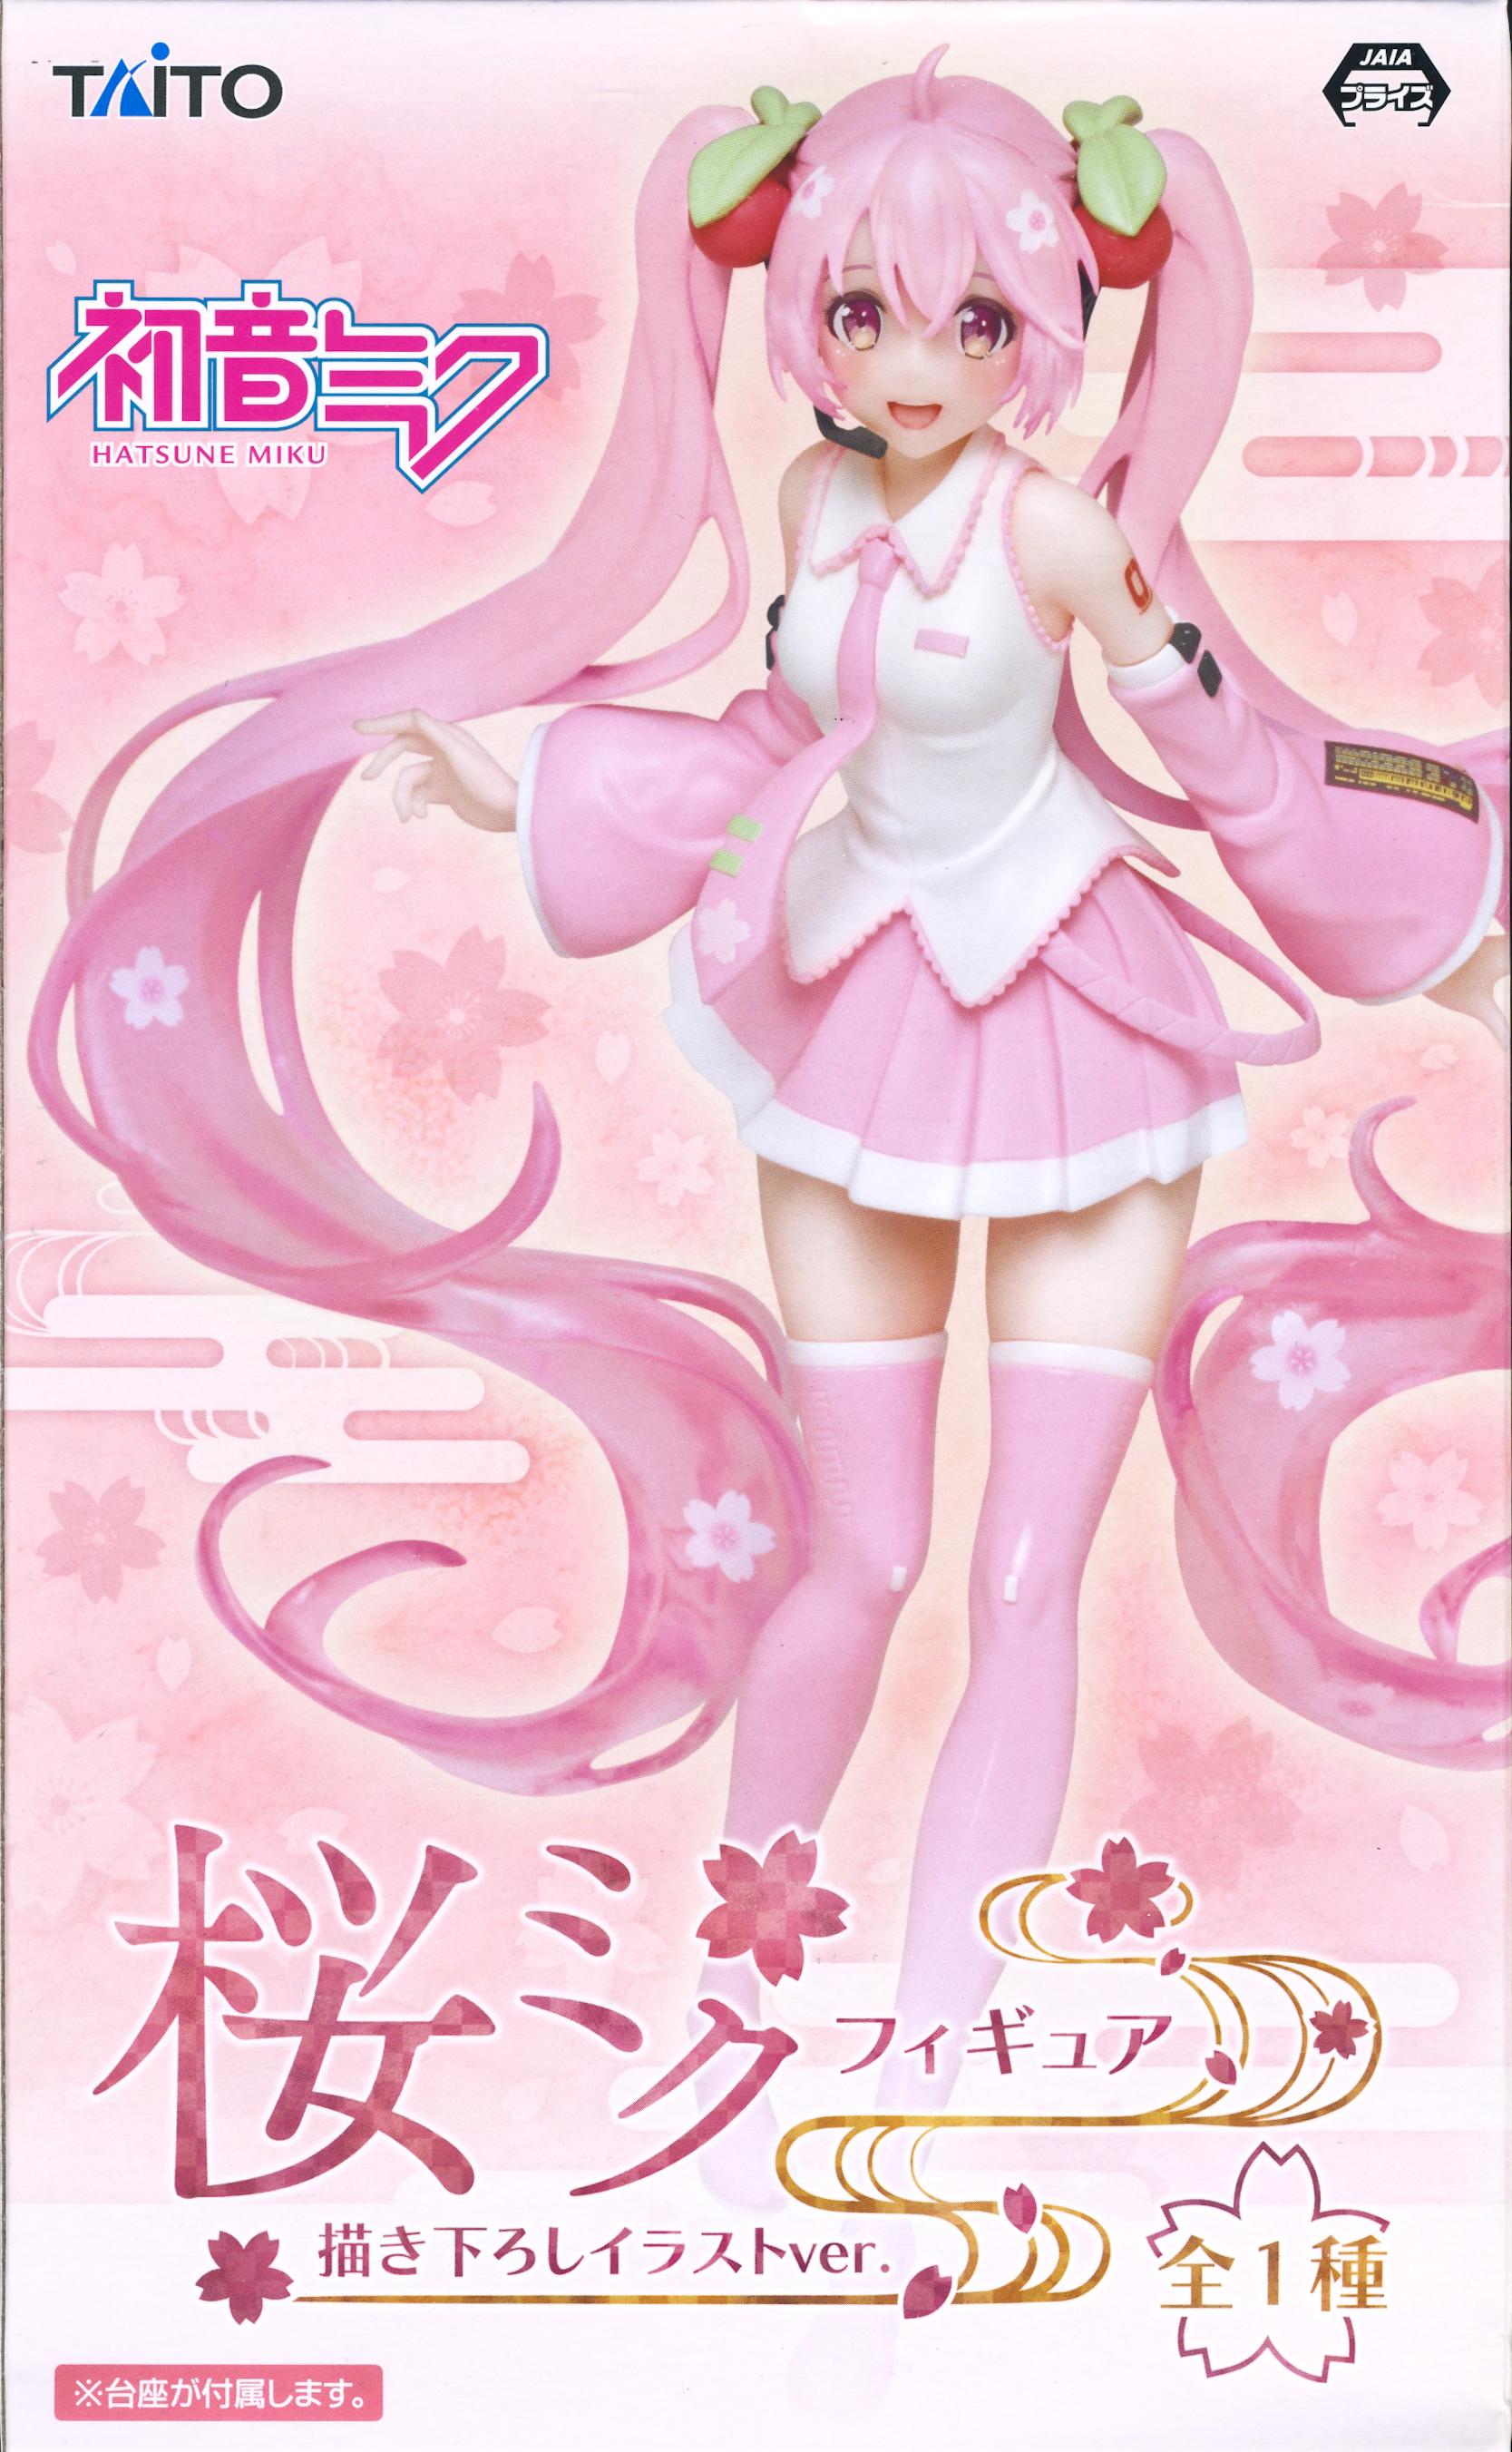 Hatsune Miku Cherry Blossoms Figure, Sakura, Vocaloid, Taito